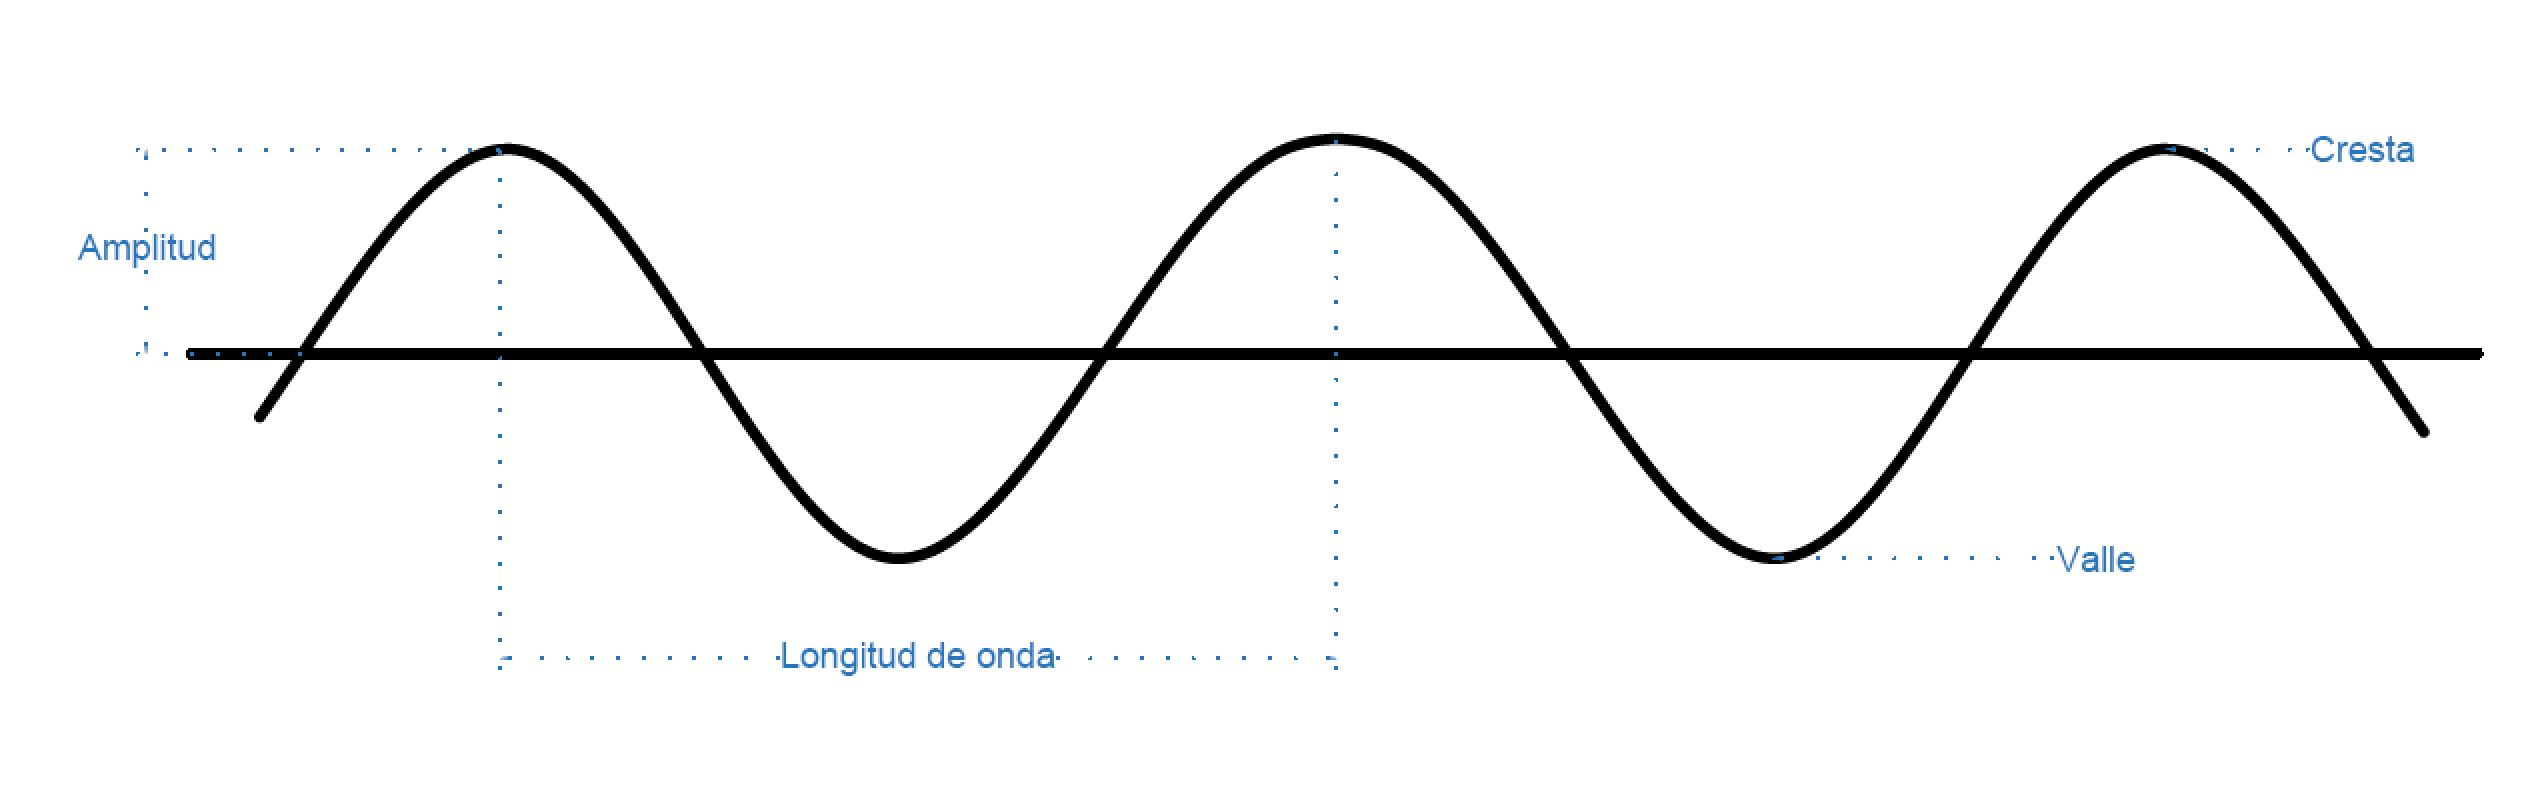 longitud transversal - Ondas transversales